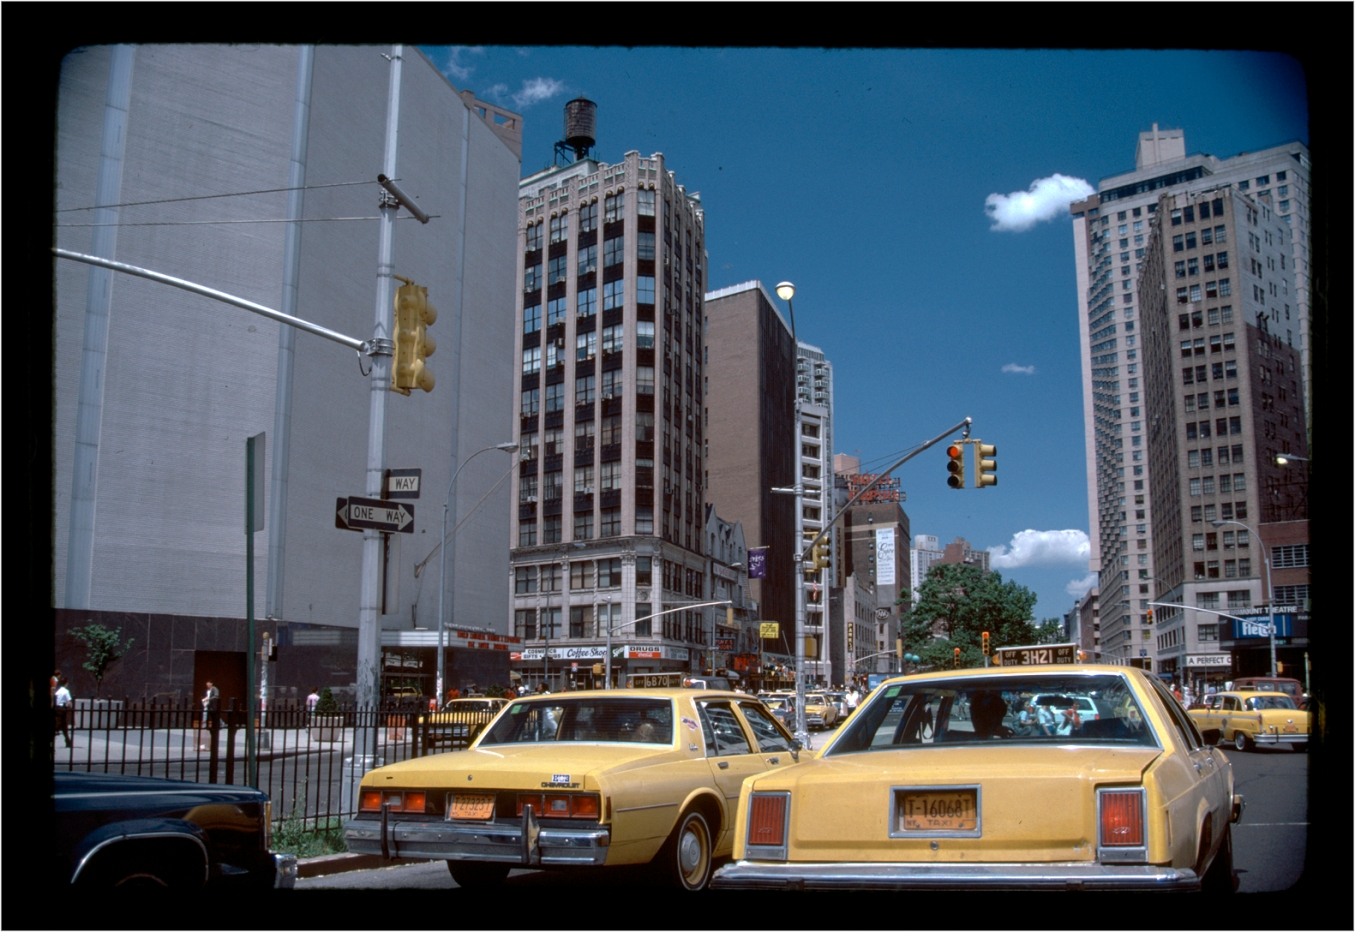 post-Taxis-Columbus-Circle-1985 copy